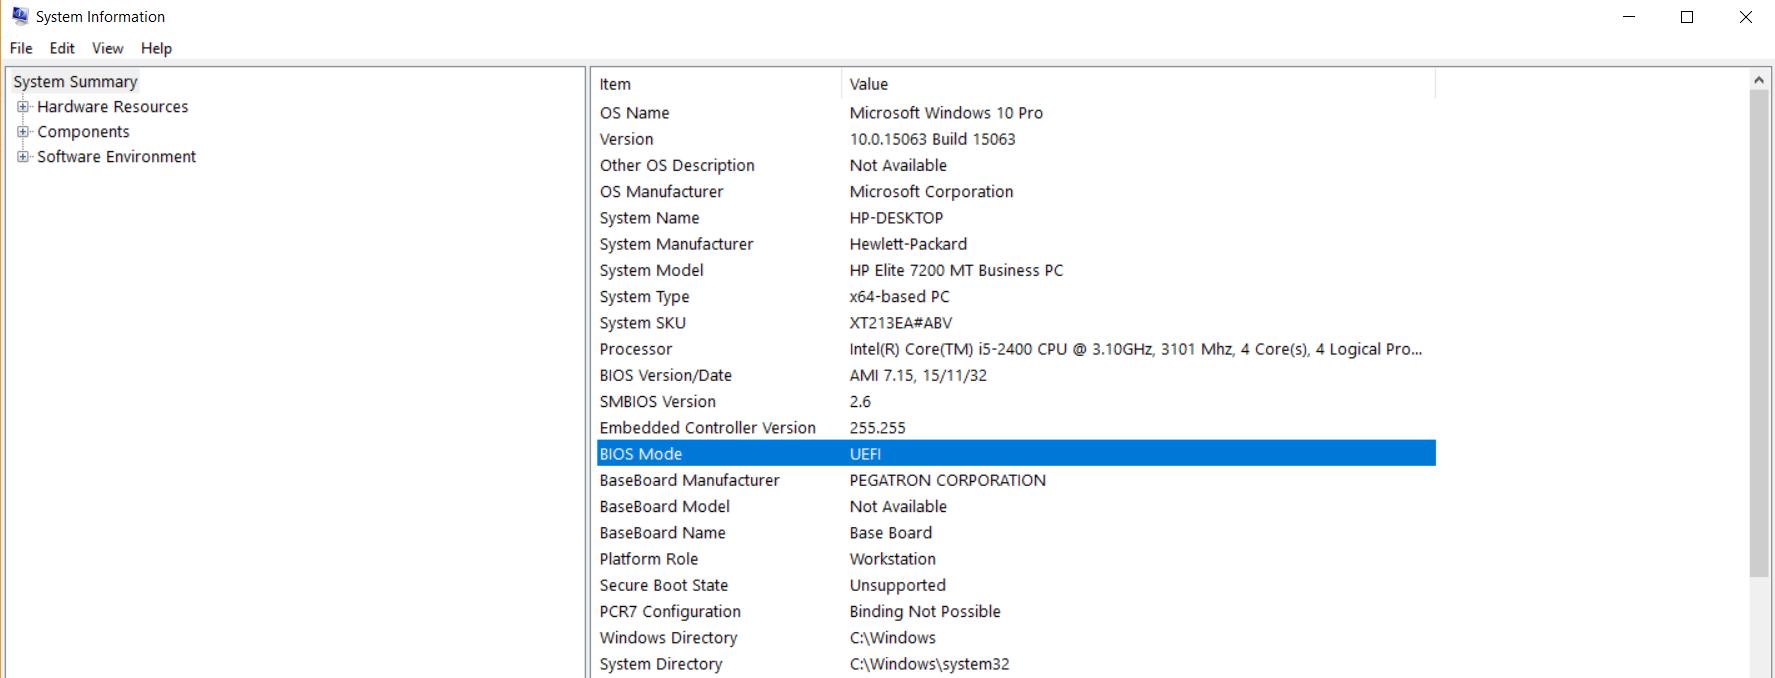 Desktop Freeze at bios/HP Splach Screen - HP Support Community - 6225166